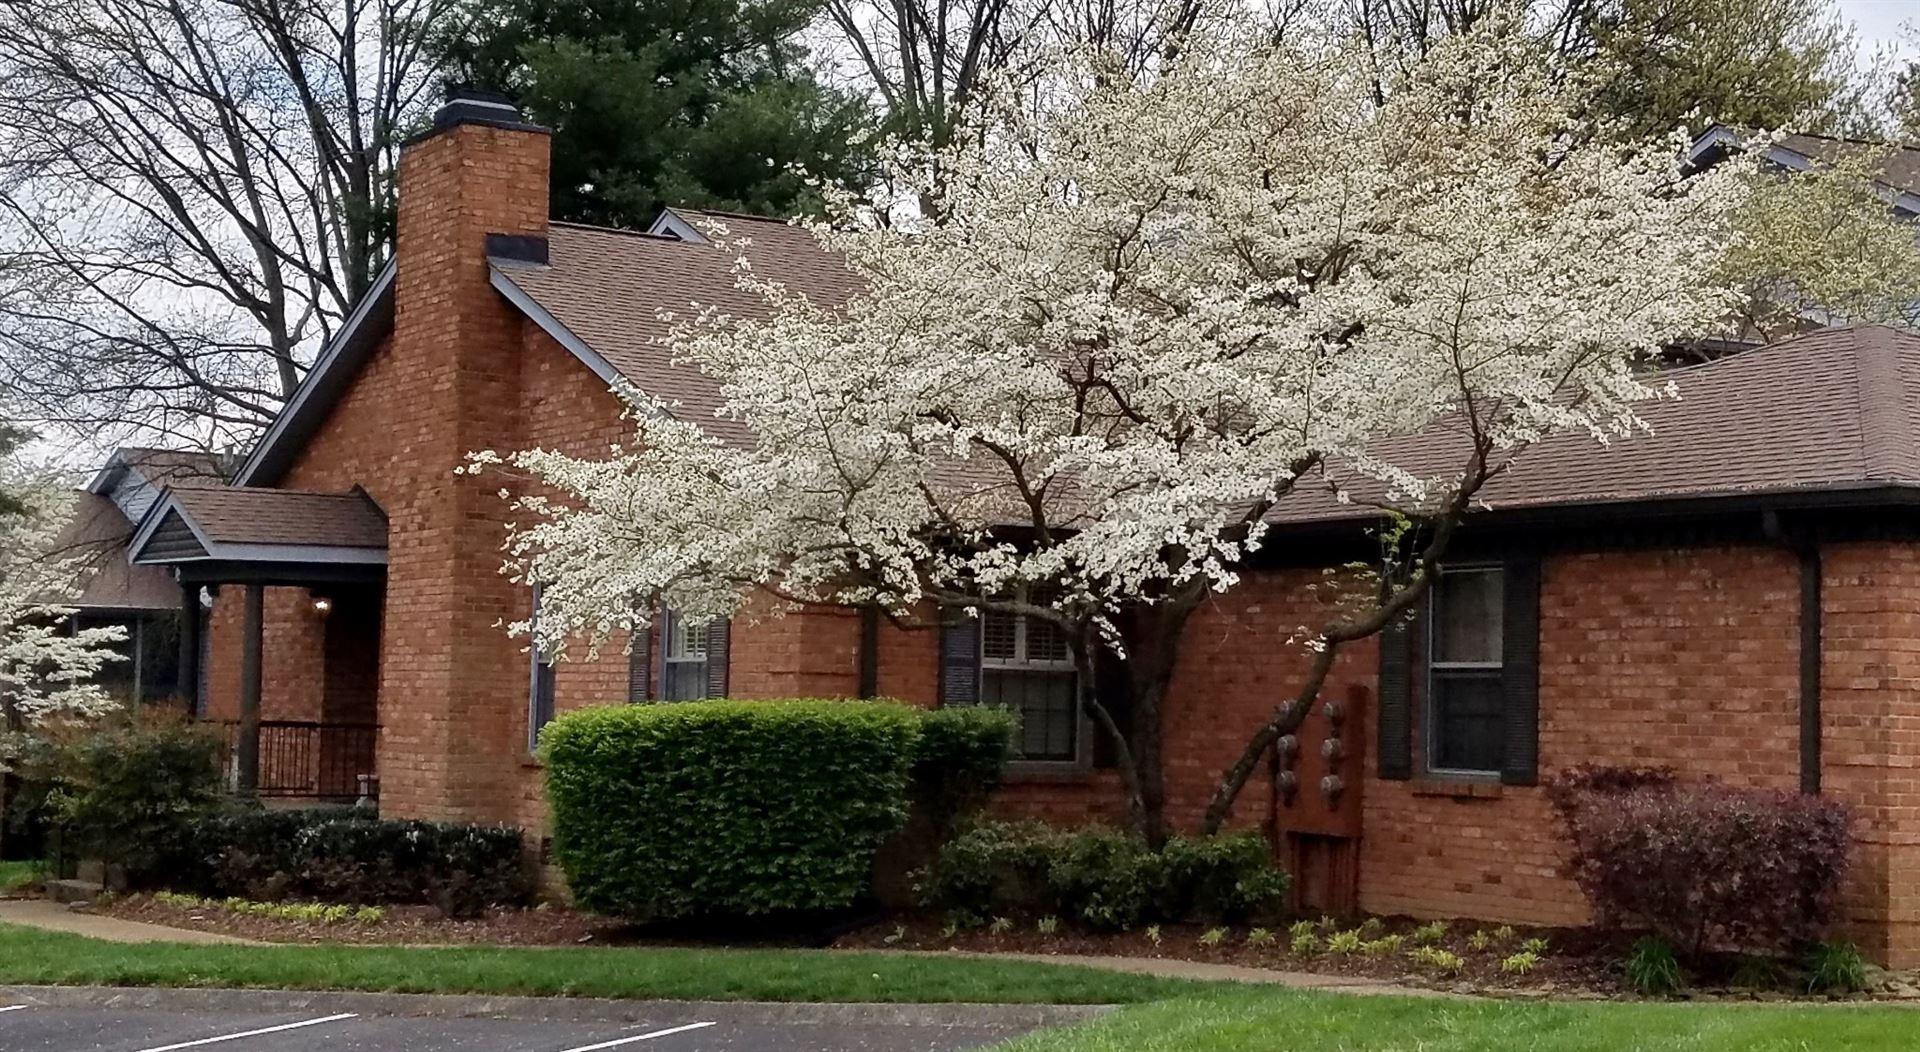 231 Hearthstone Manor Ln, Brentwood, TN 37027 - MLS#: 2210144